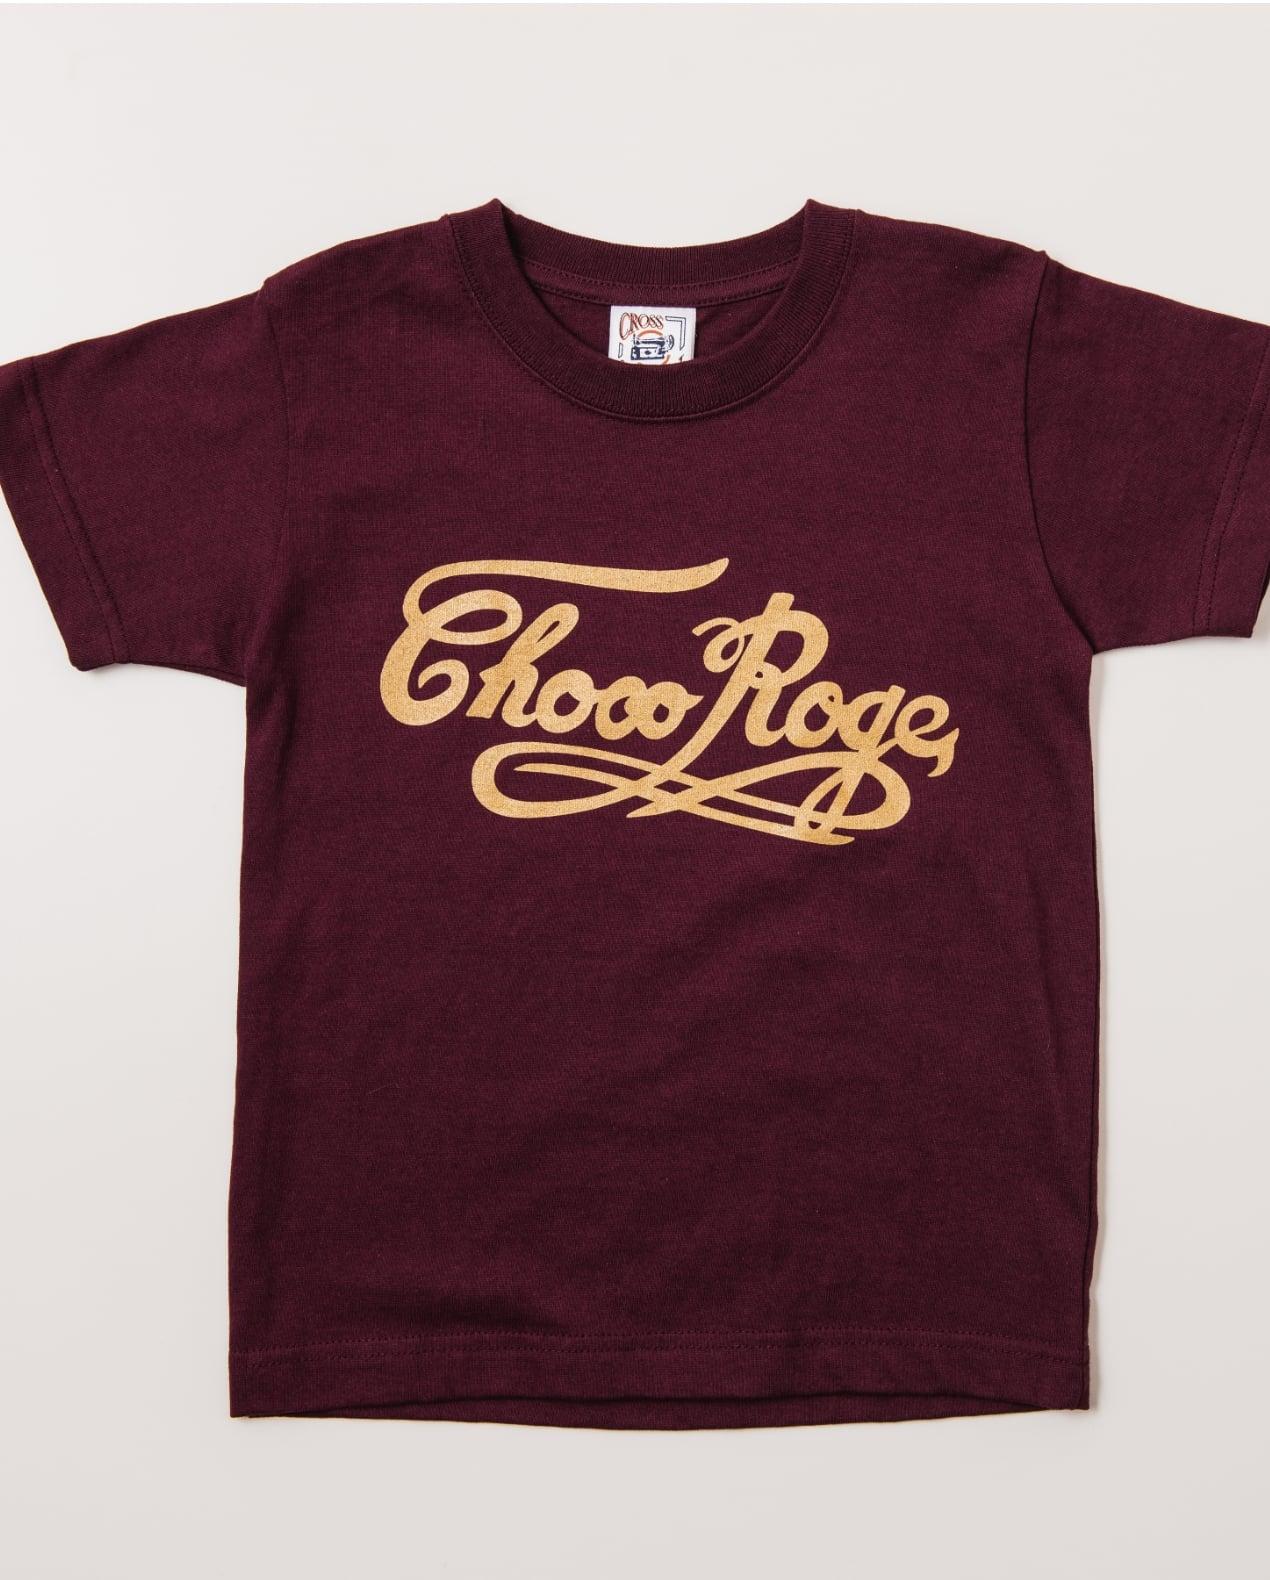 Tシャツ 大人用 茶色 サイズS